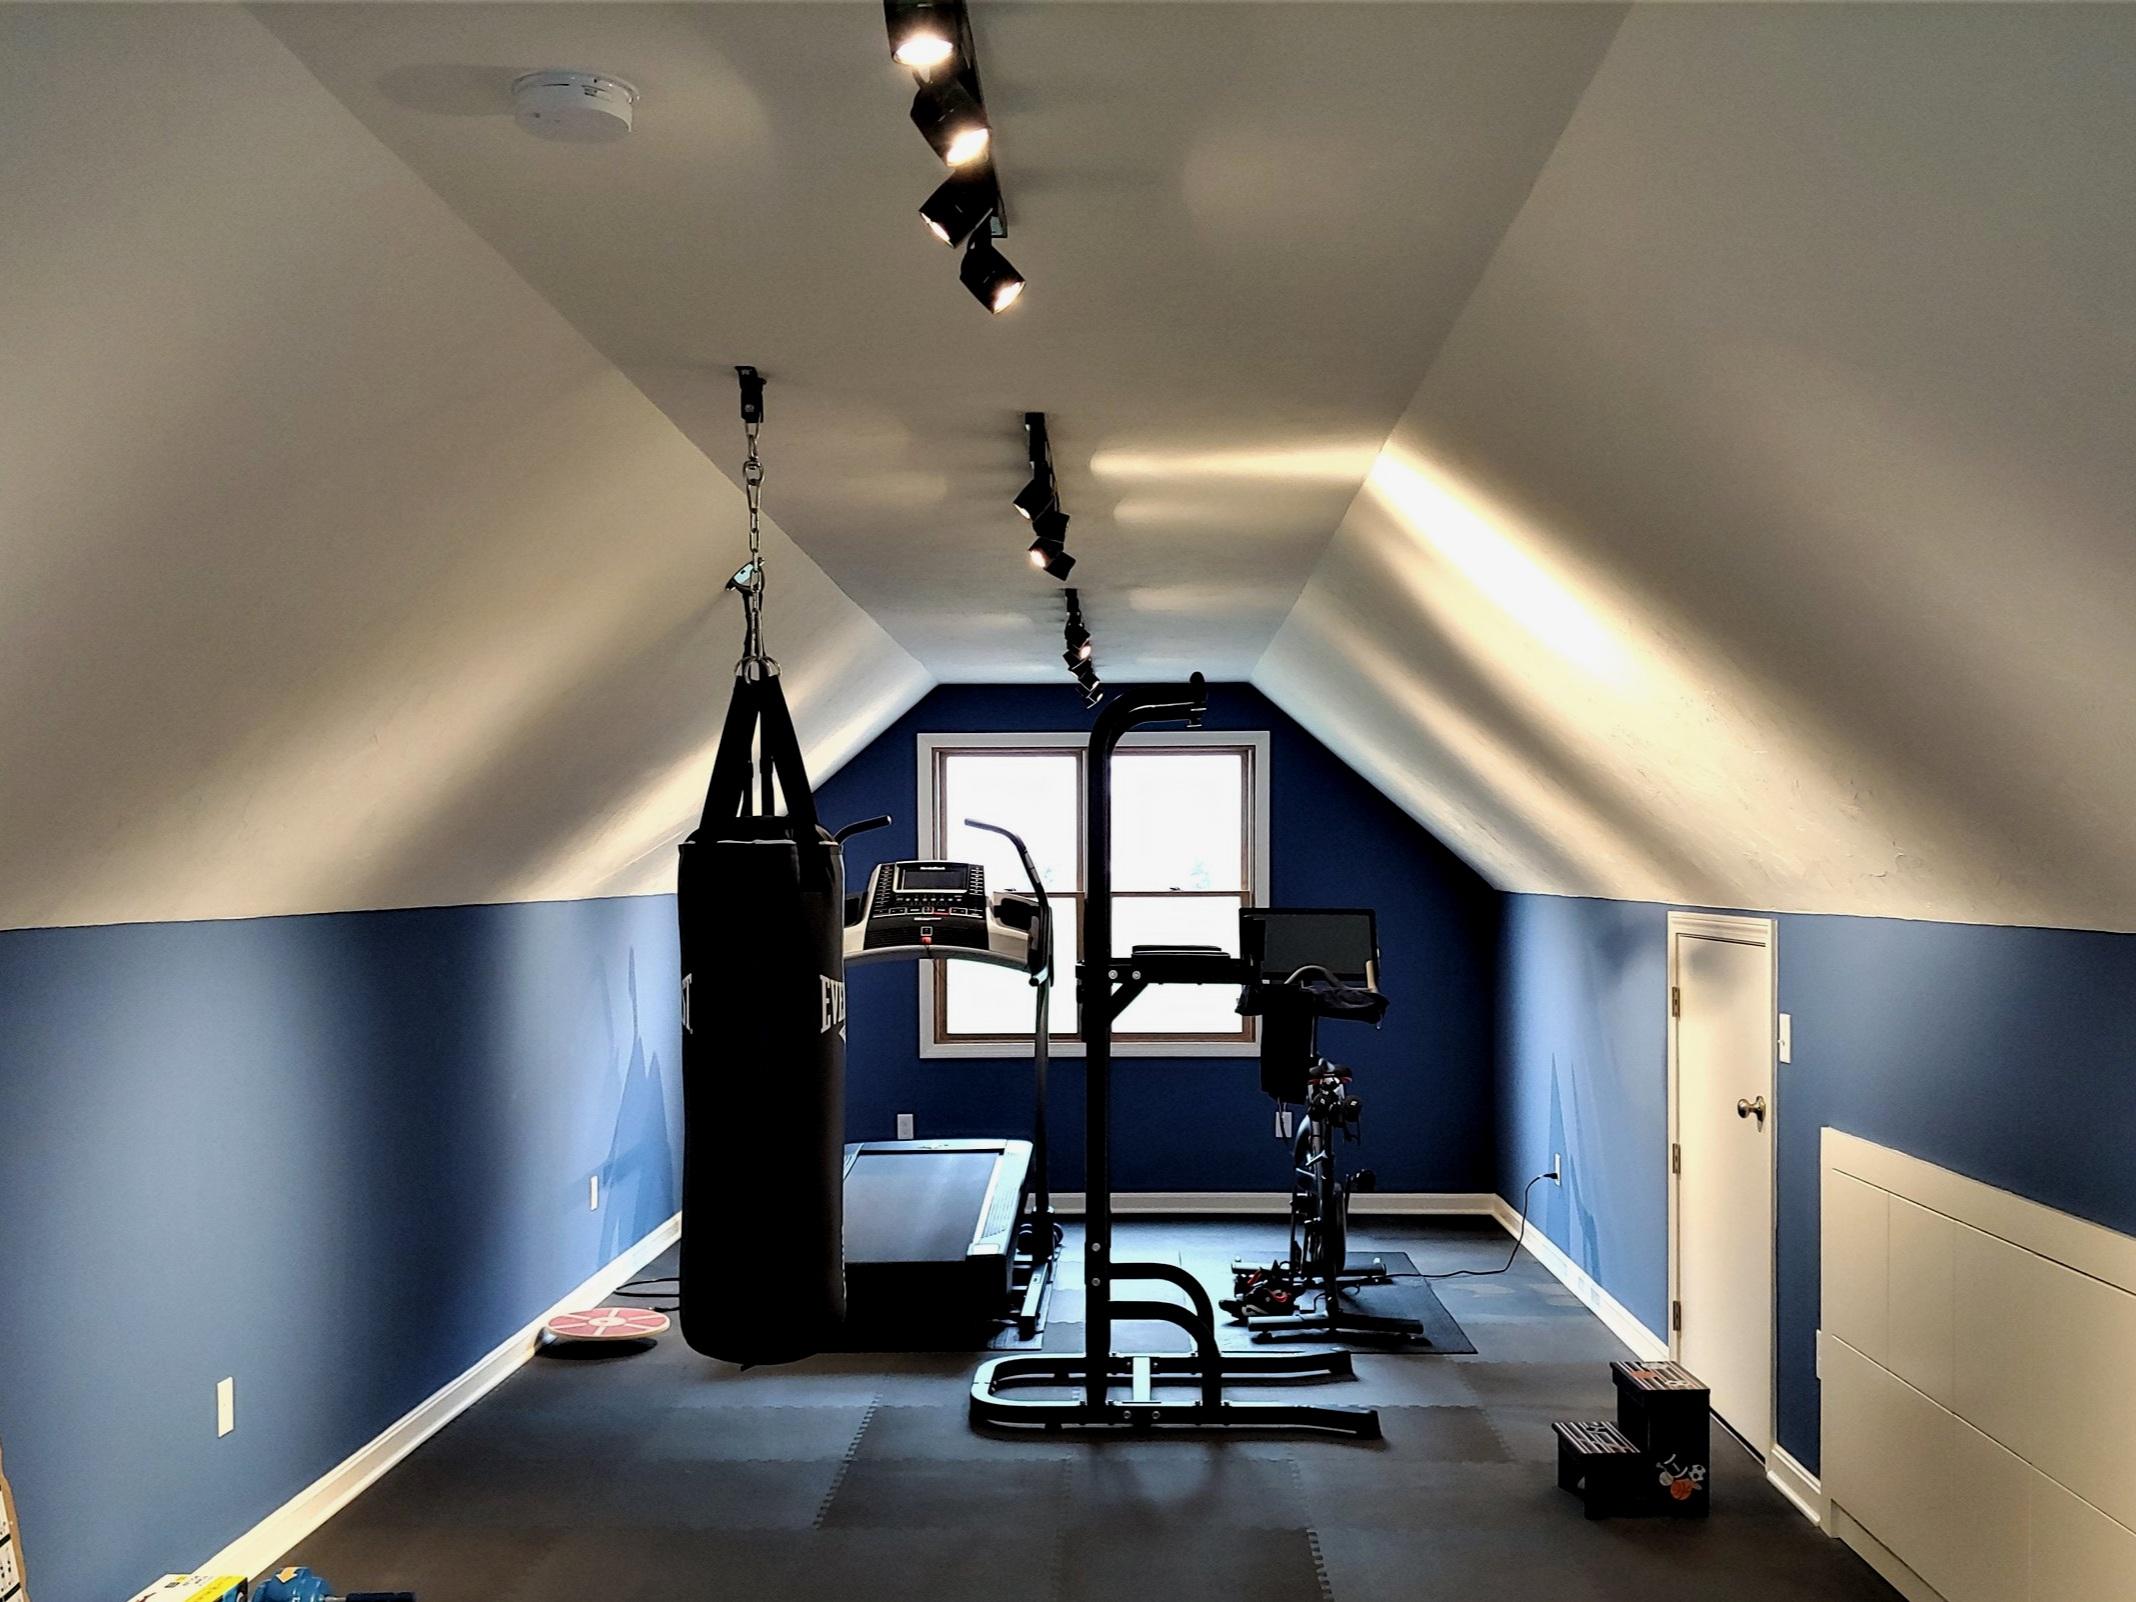 Attic Remodeling Project/Attic Renovation - Hudson MA